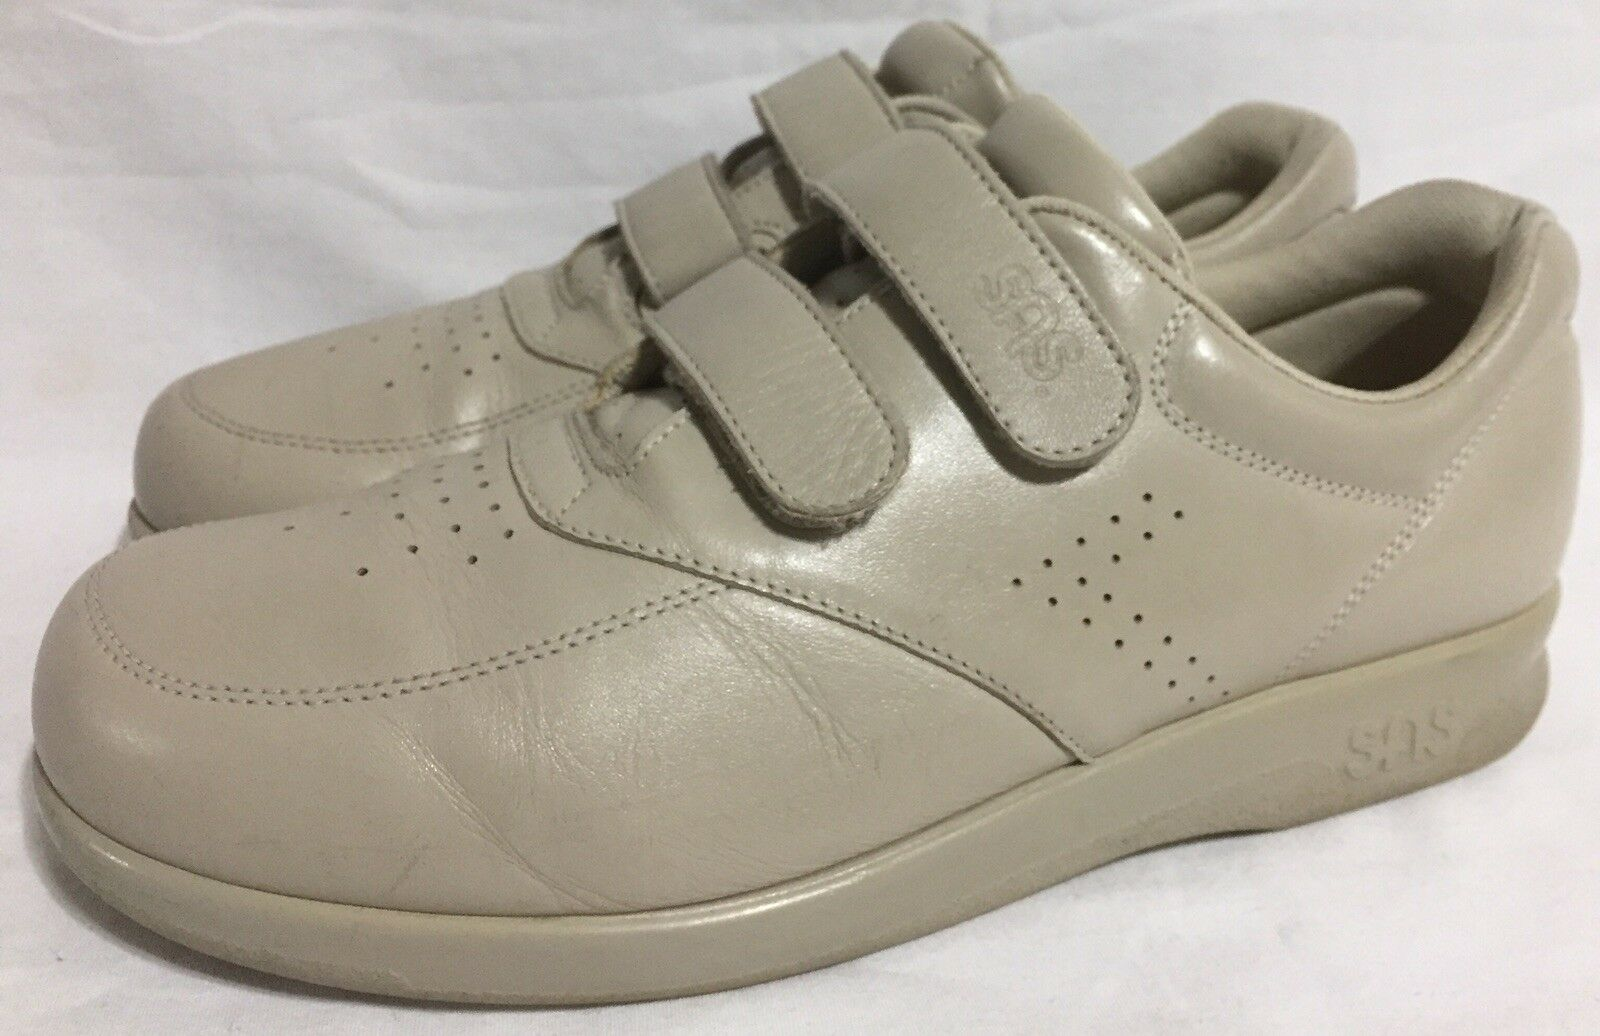 SAS Walking shoes Tan Leather Tripad Comfort Orthopedic Hook&Loop 2Z1 Women's 9S